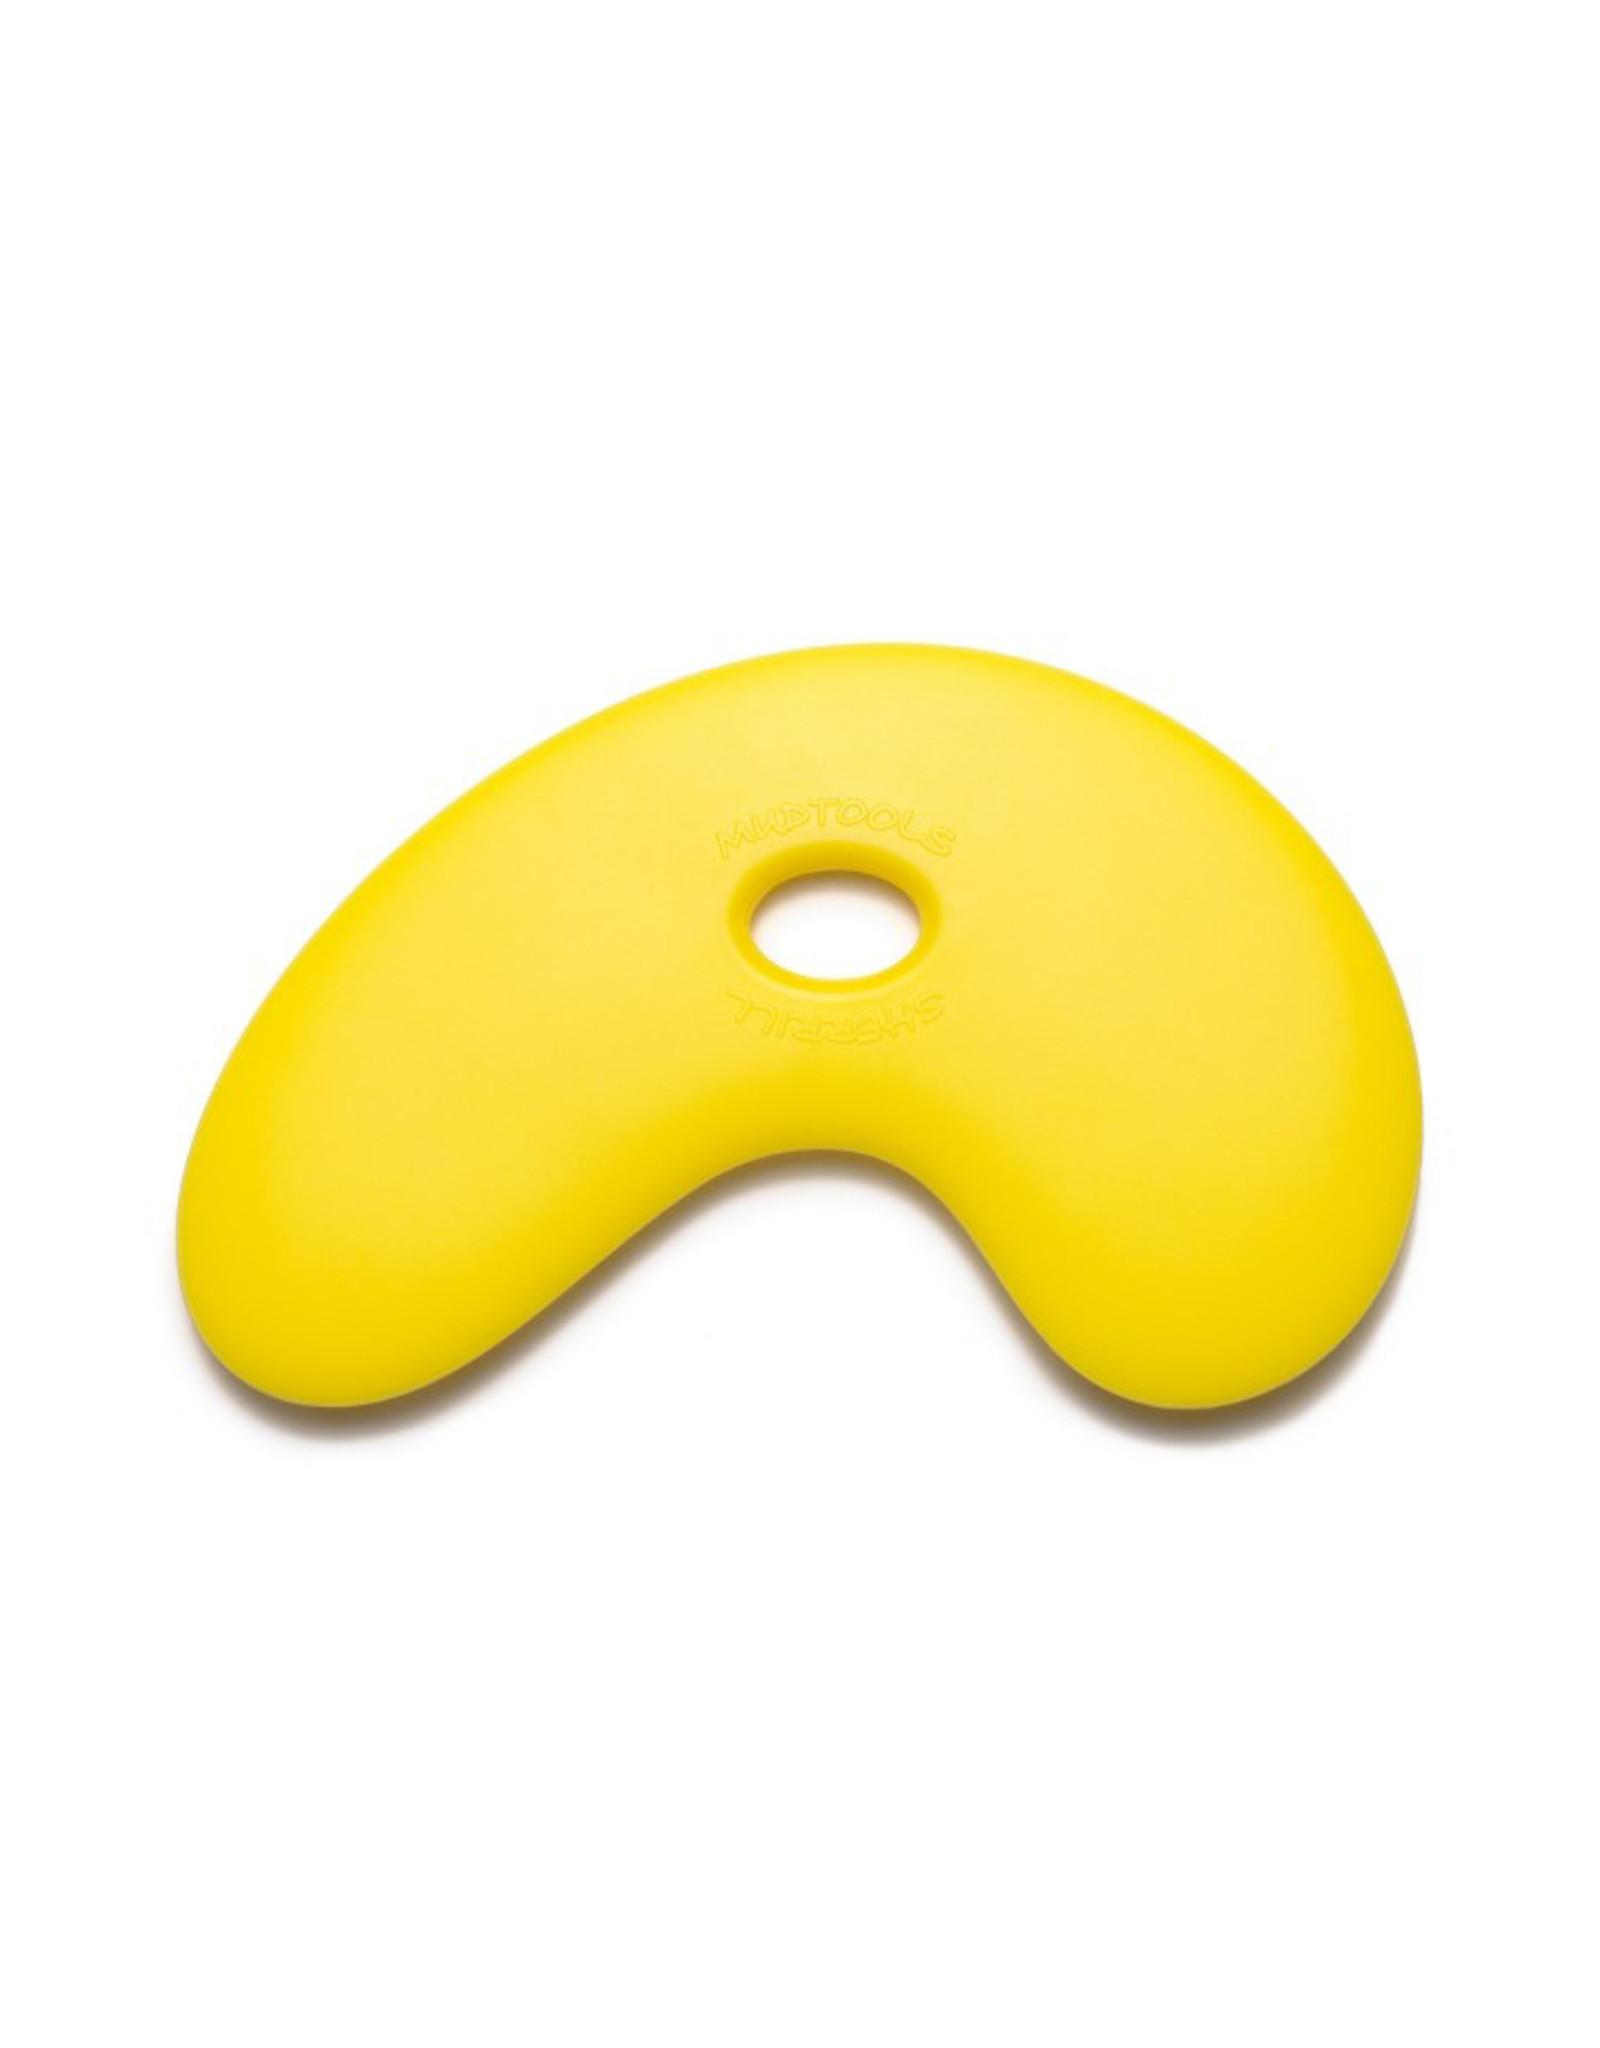 Mudtools Small Bowl Rib (yellow)